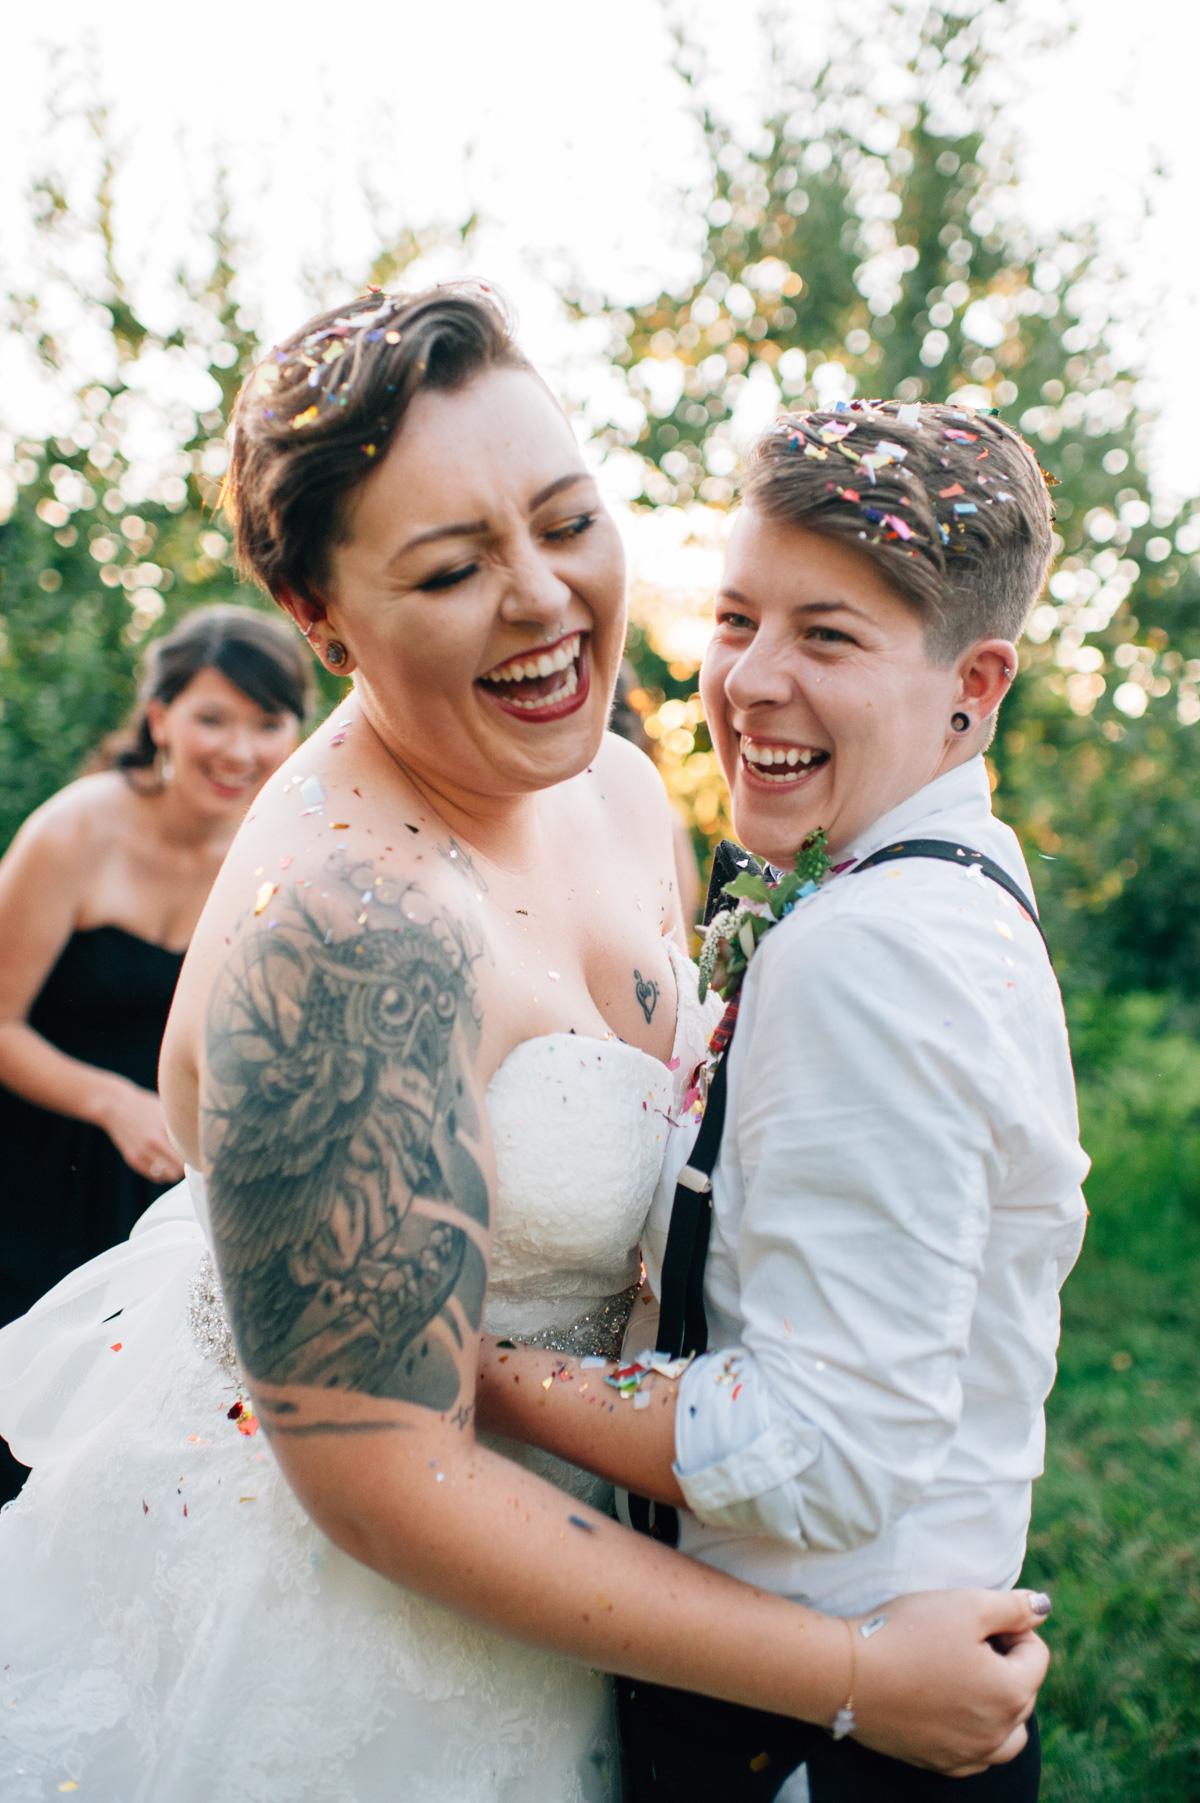 sara-wilde-photography-vineyard-bride-swish-list-beamer-falls-manor-grimsby-wedding-59.jpg